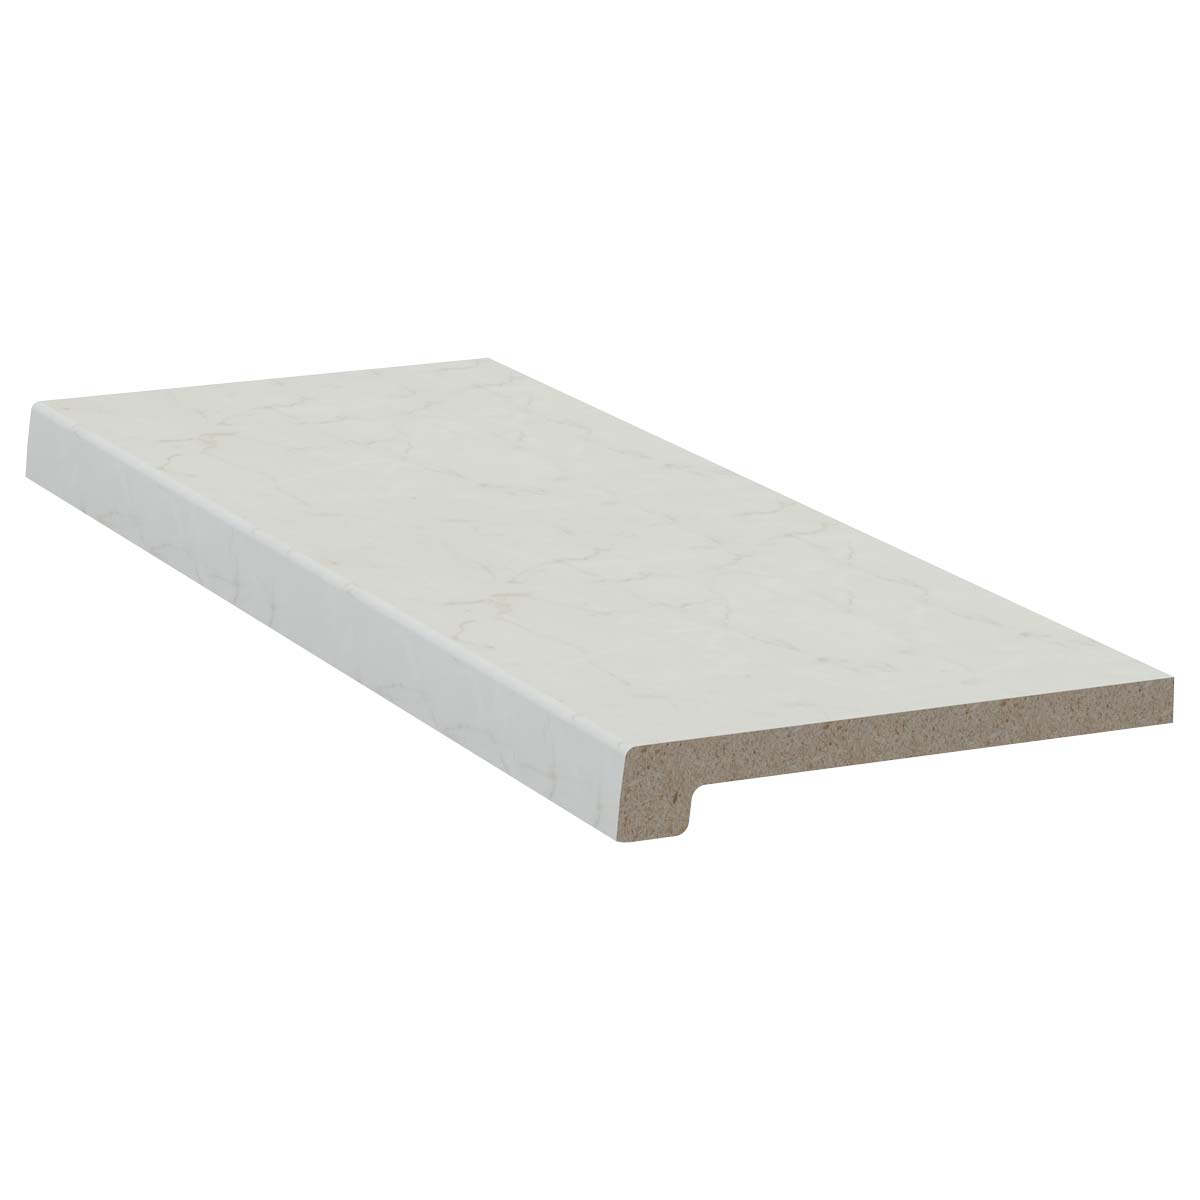 exclusiv 070 - https://www.werzalit.com/en/product/exclusiv-interior-window-sill-length-6000-mm-width-300-mm-decor-070-marmor-bianco/